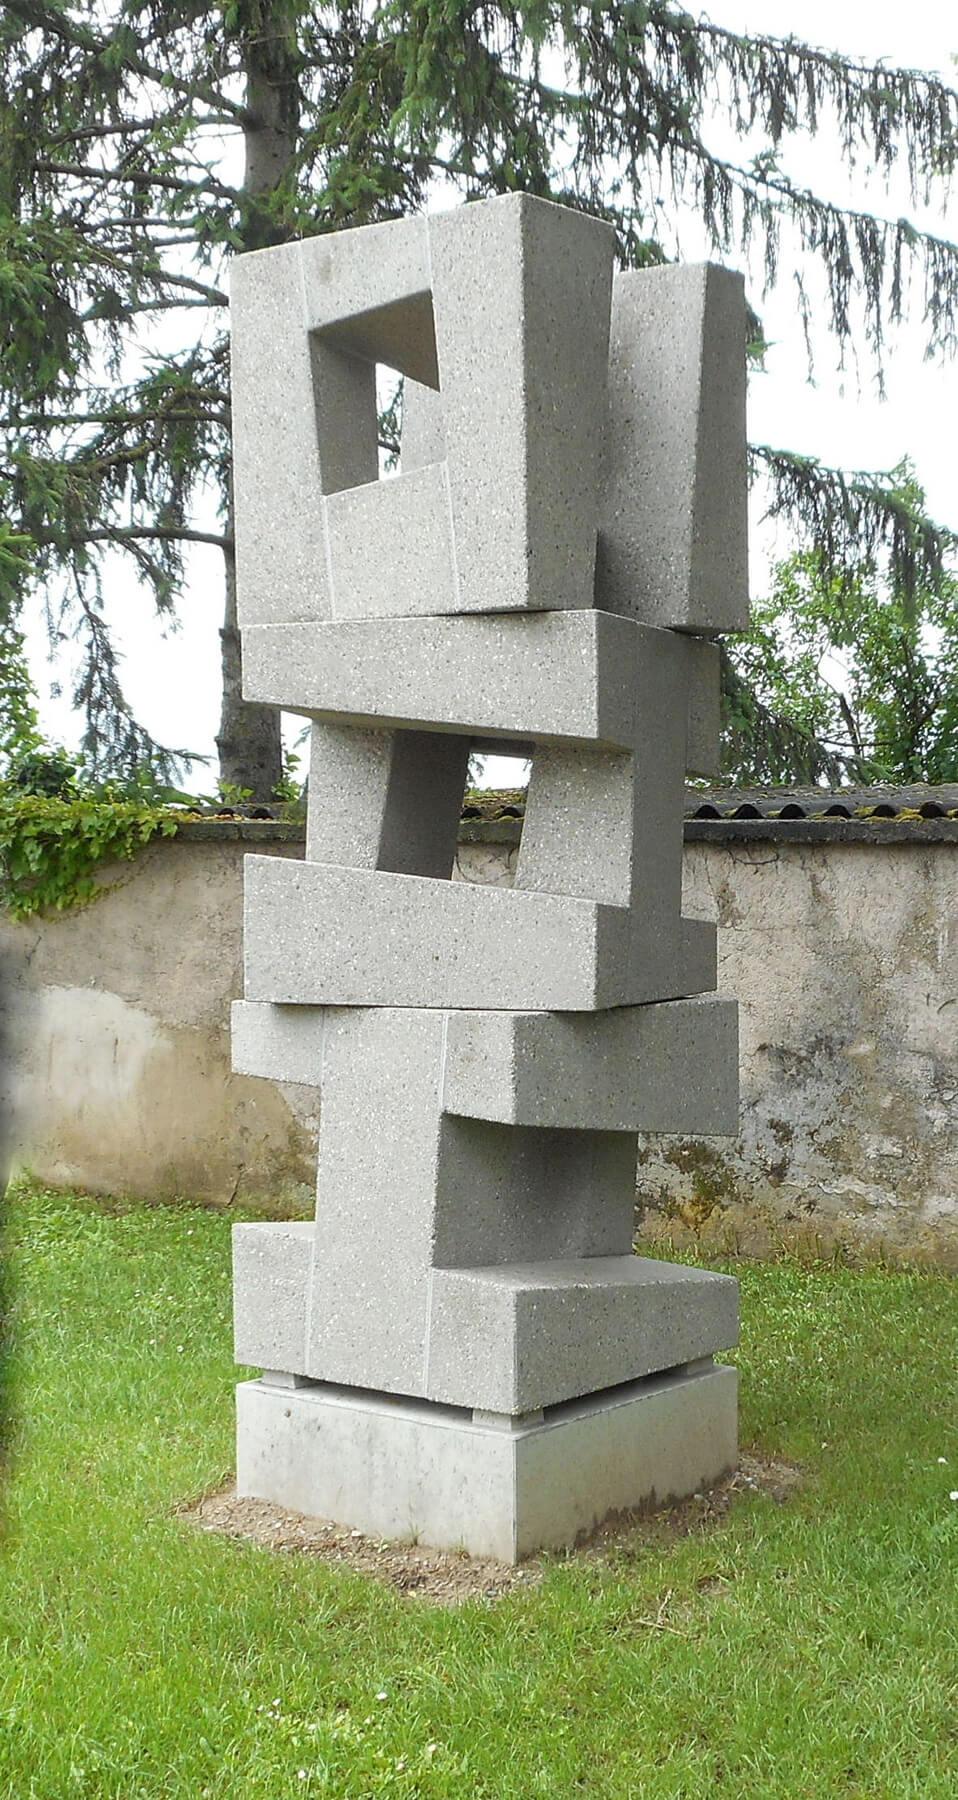 Bildhauer OMI Riesterer Skulpturen Würfelturm Beton Grezhausen